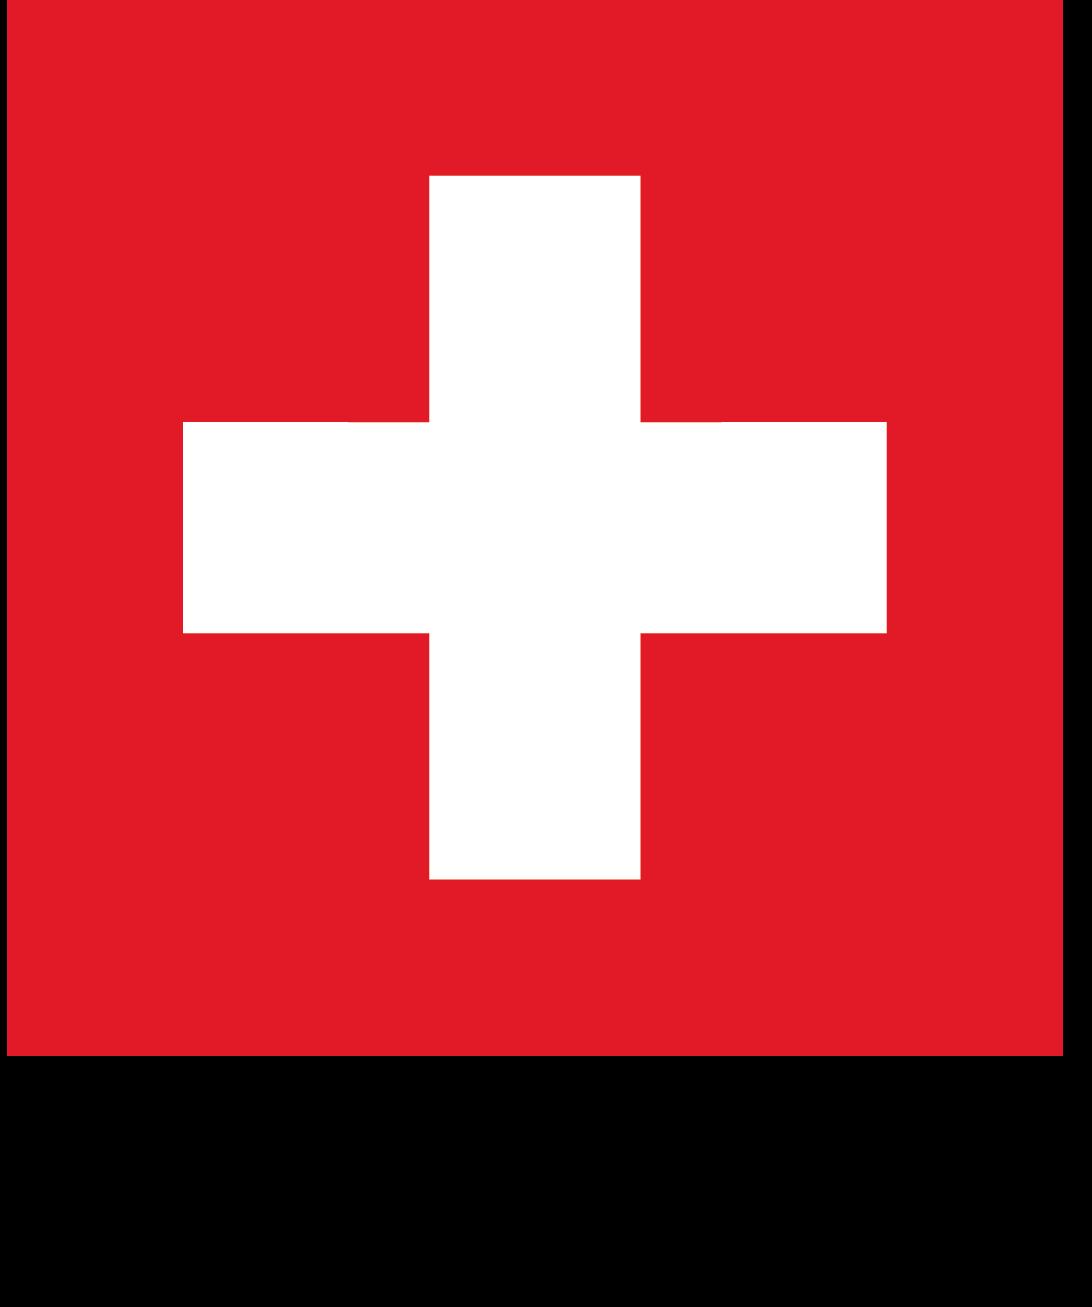 Consulate General of Switzerland